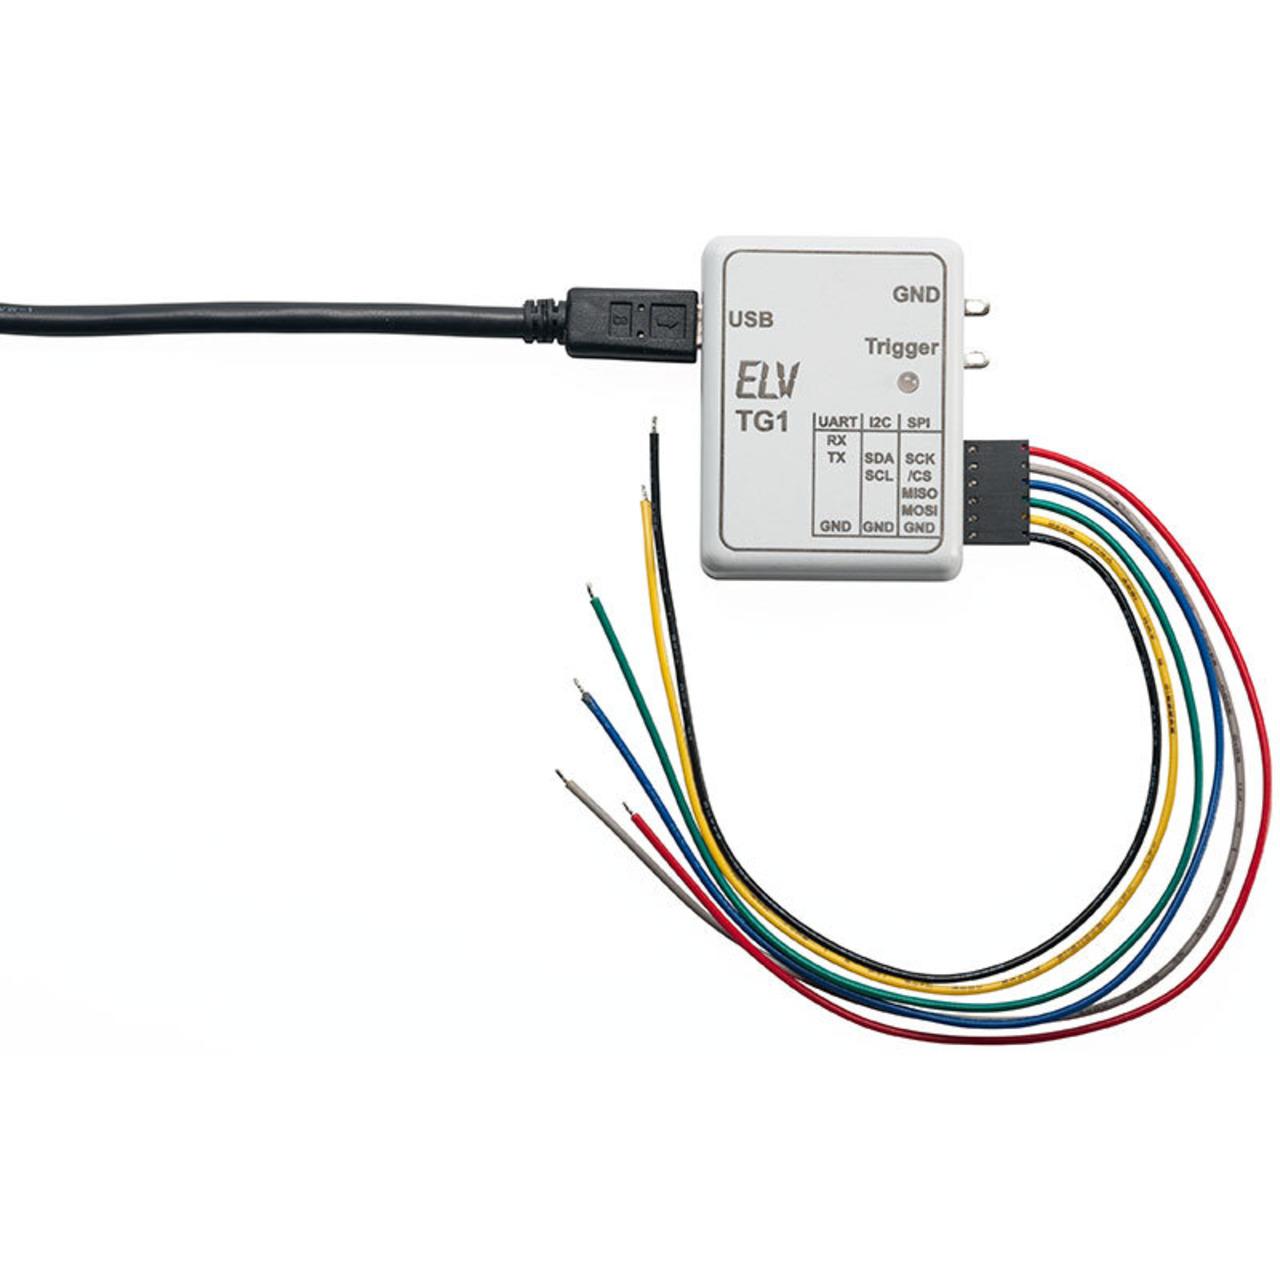 ELV Komplettbausatz Triggergenerator TG1 für SPI-I2C-UART